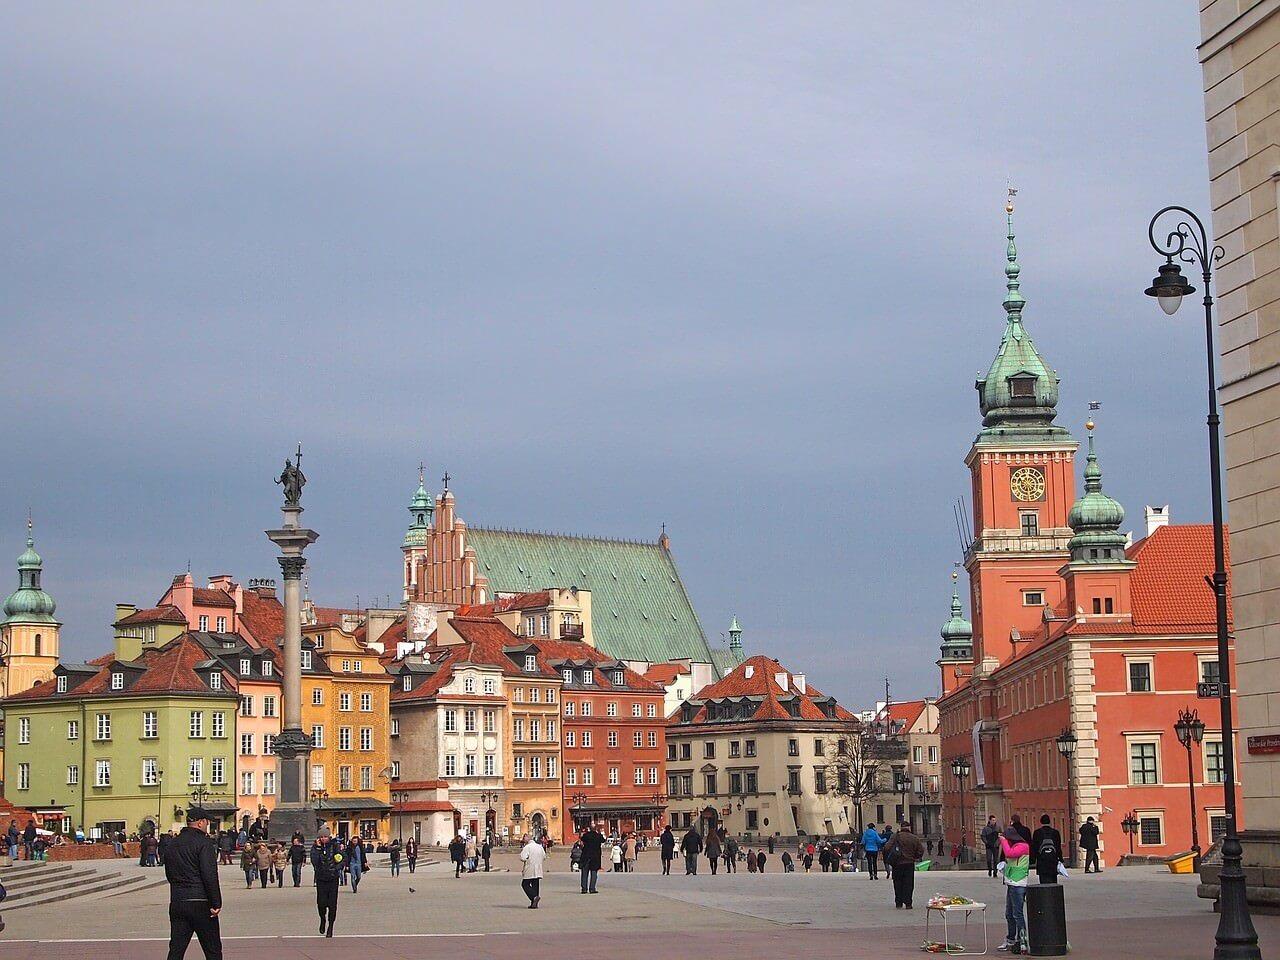 warsawa staro mesto centre historique de Varsovie